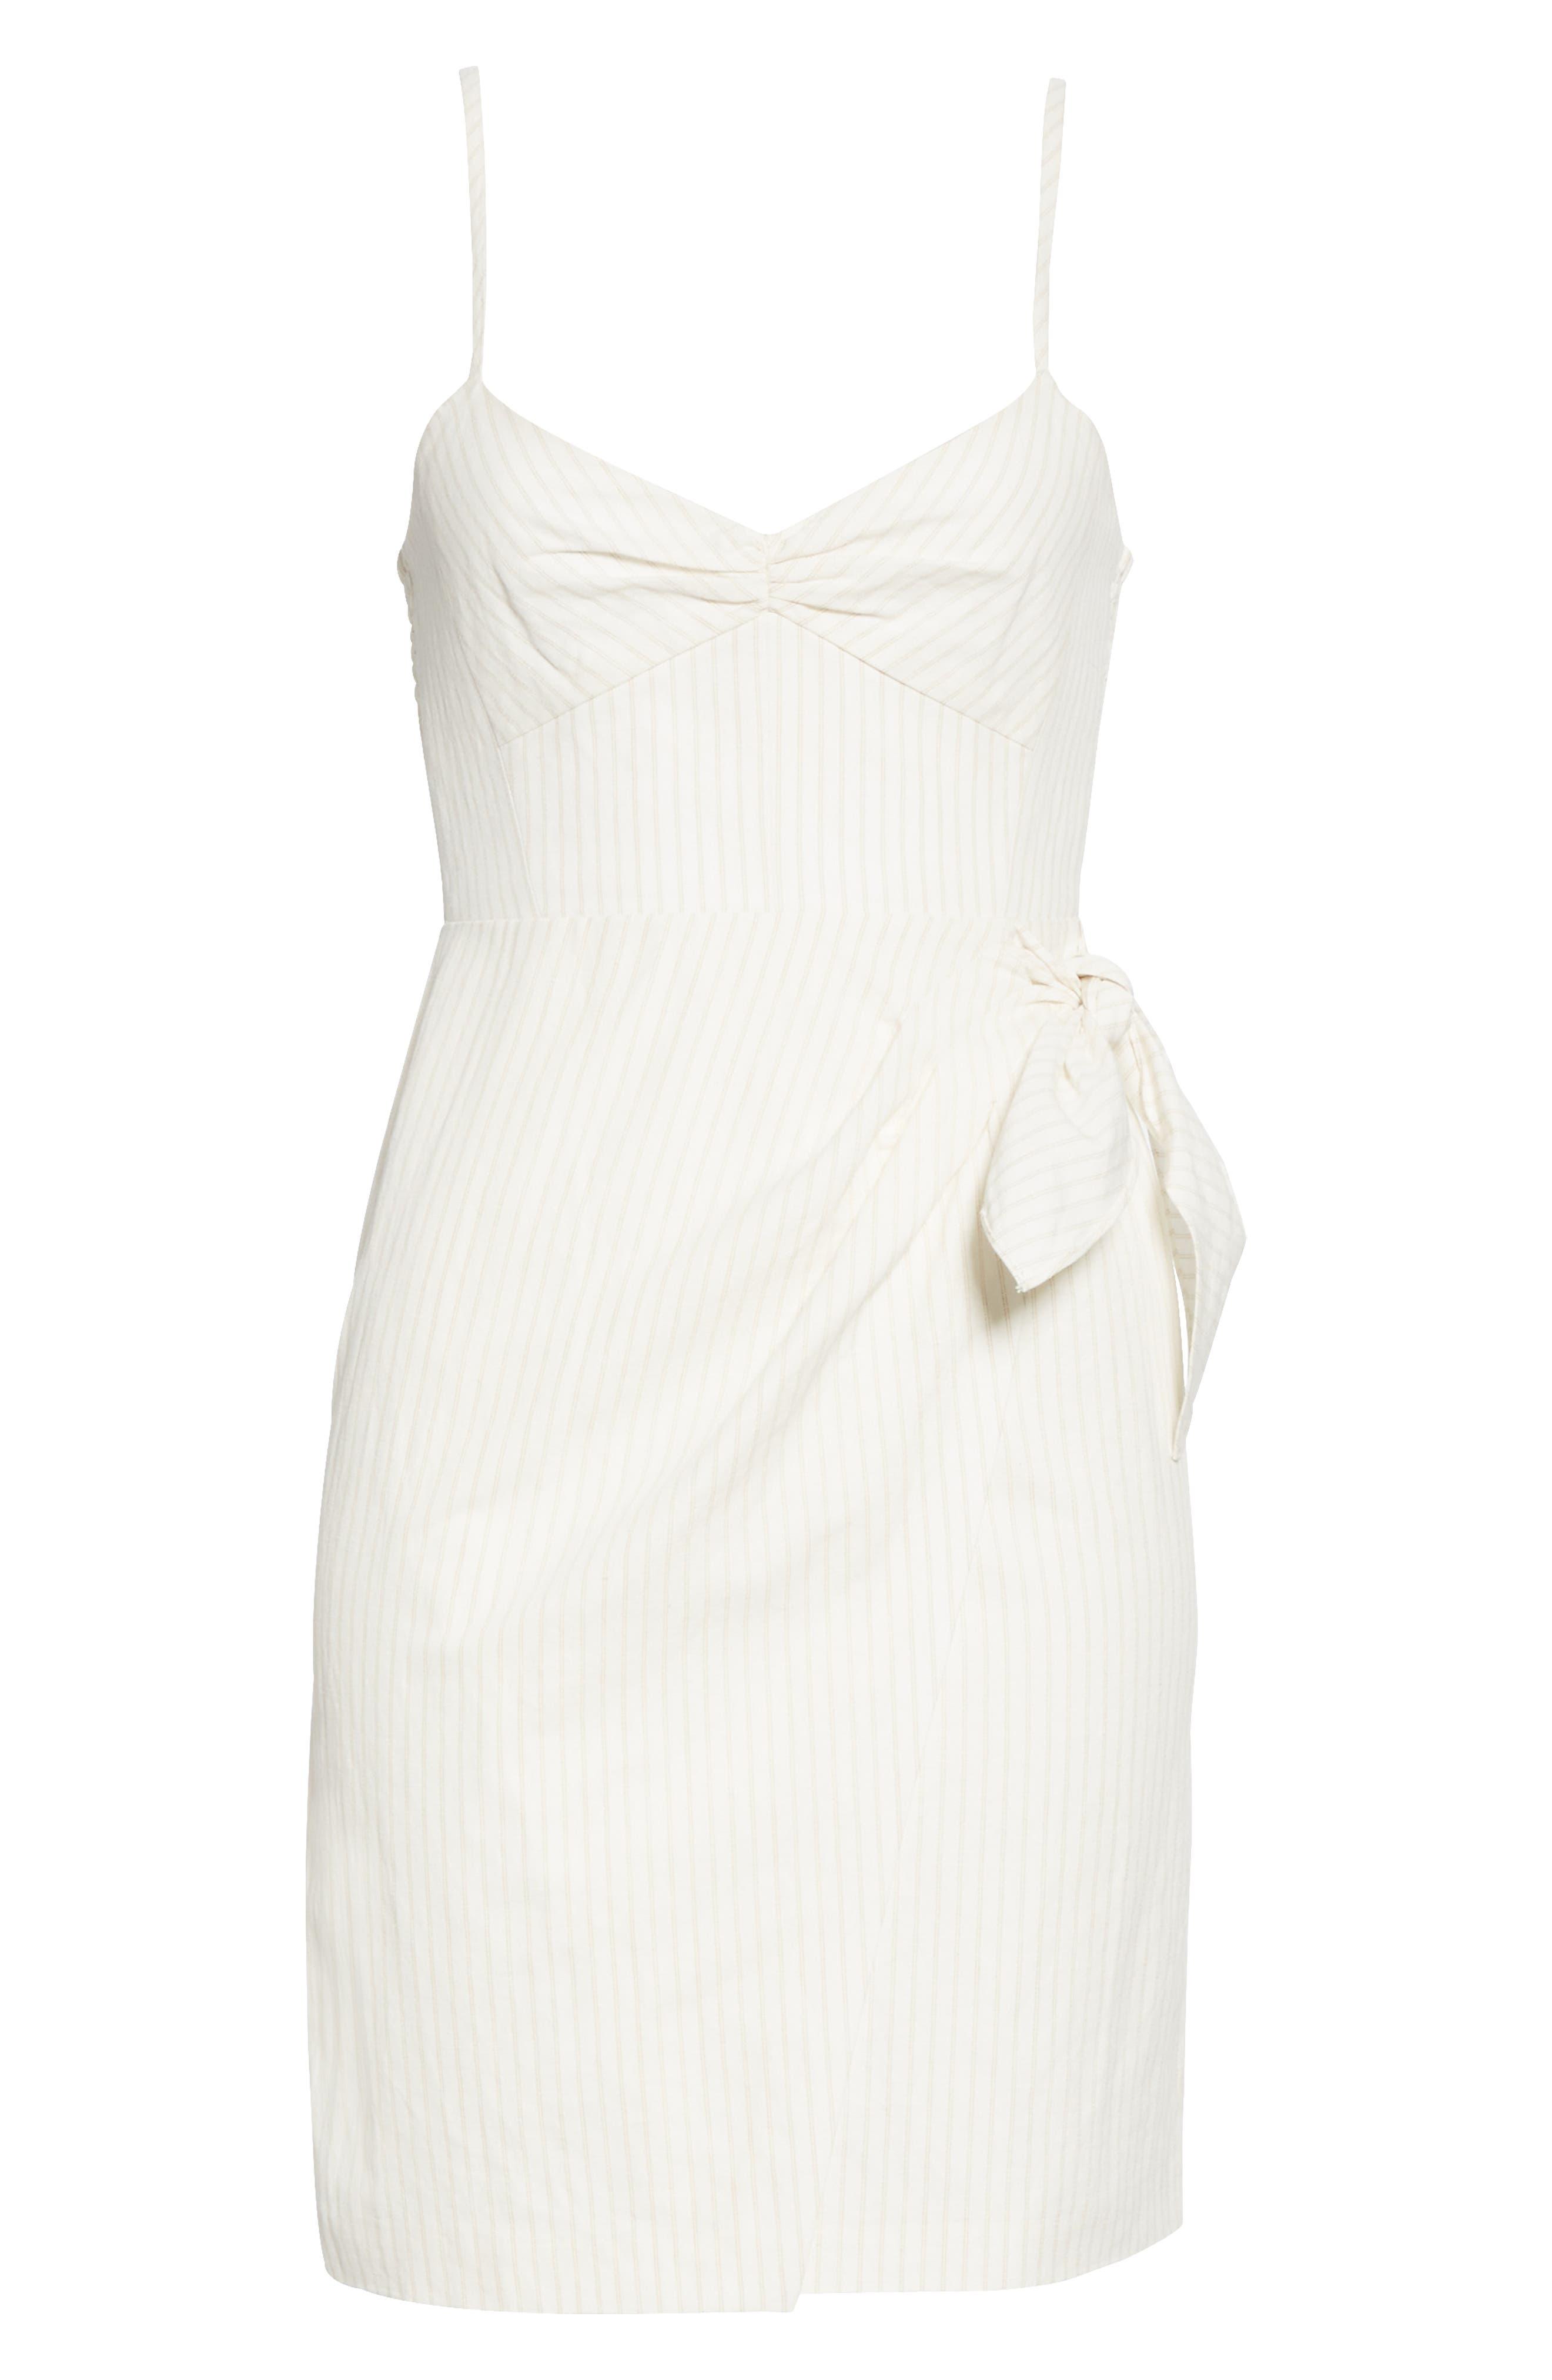 REBECCA TAYLOR, Pinstripe Cotton & Linen Dress, Alternate thumbnail 6, color, SNOW COMBO